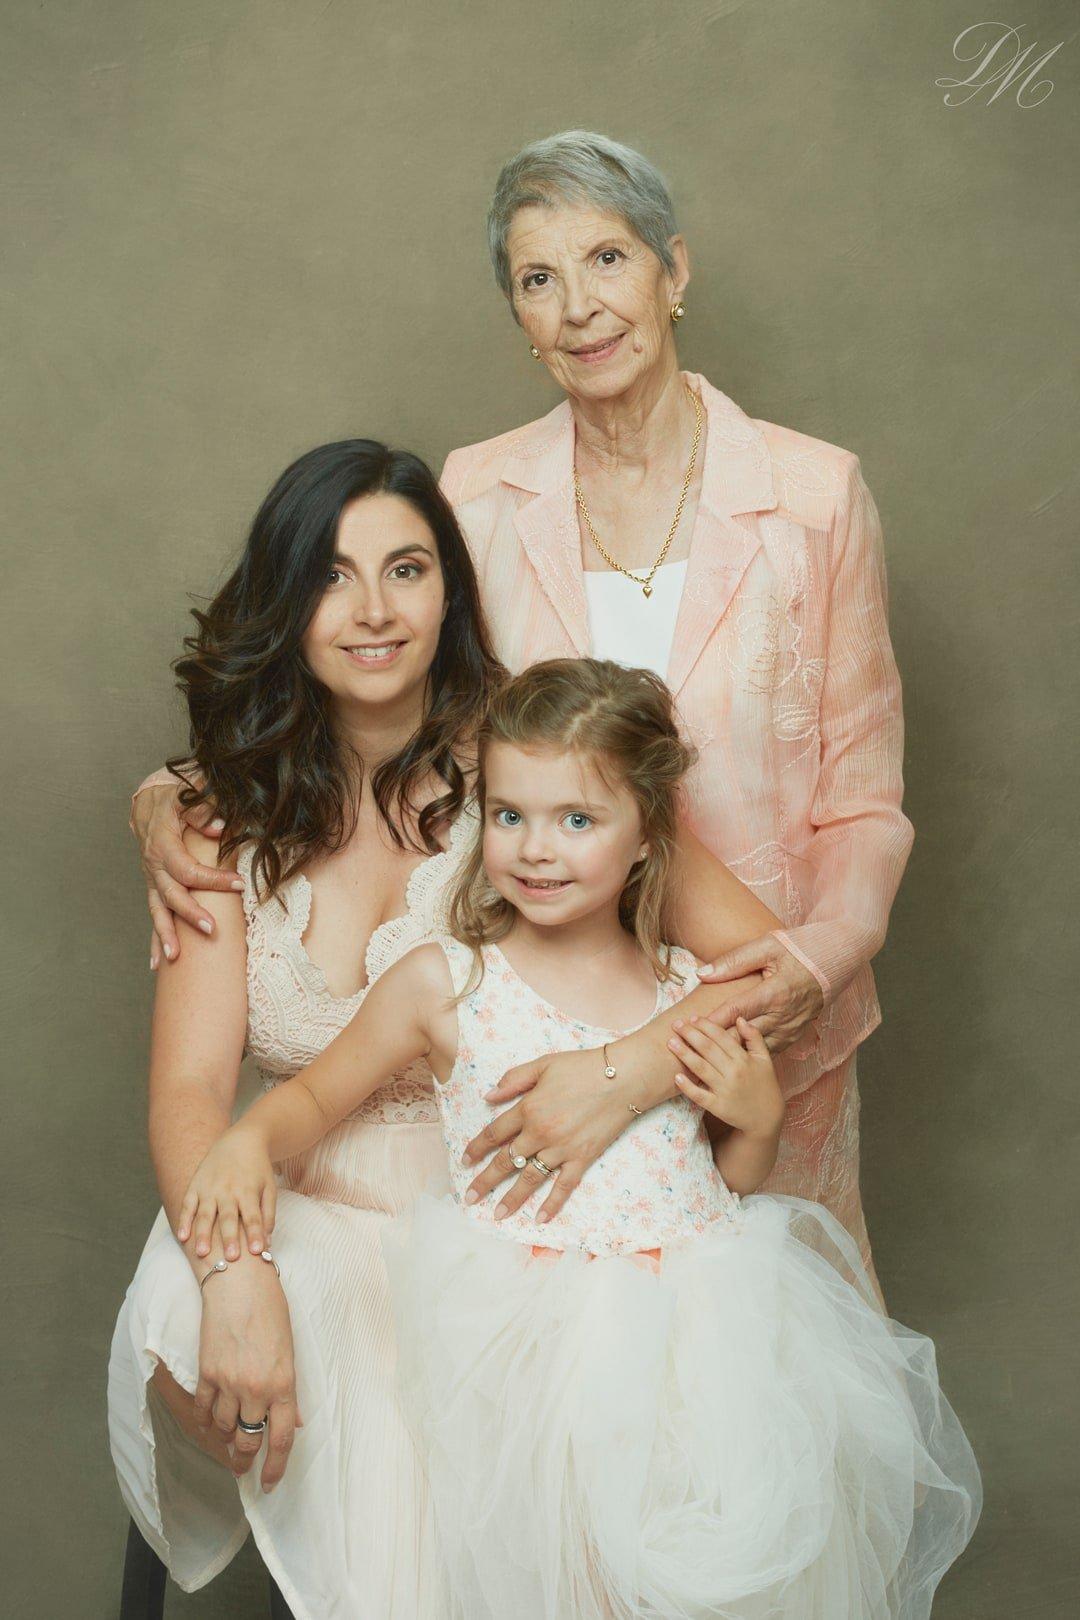 photographe strasbourg famille portrait molina c06